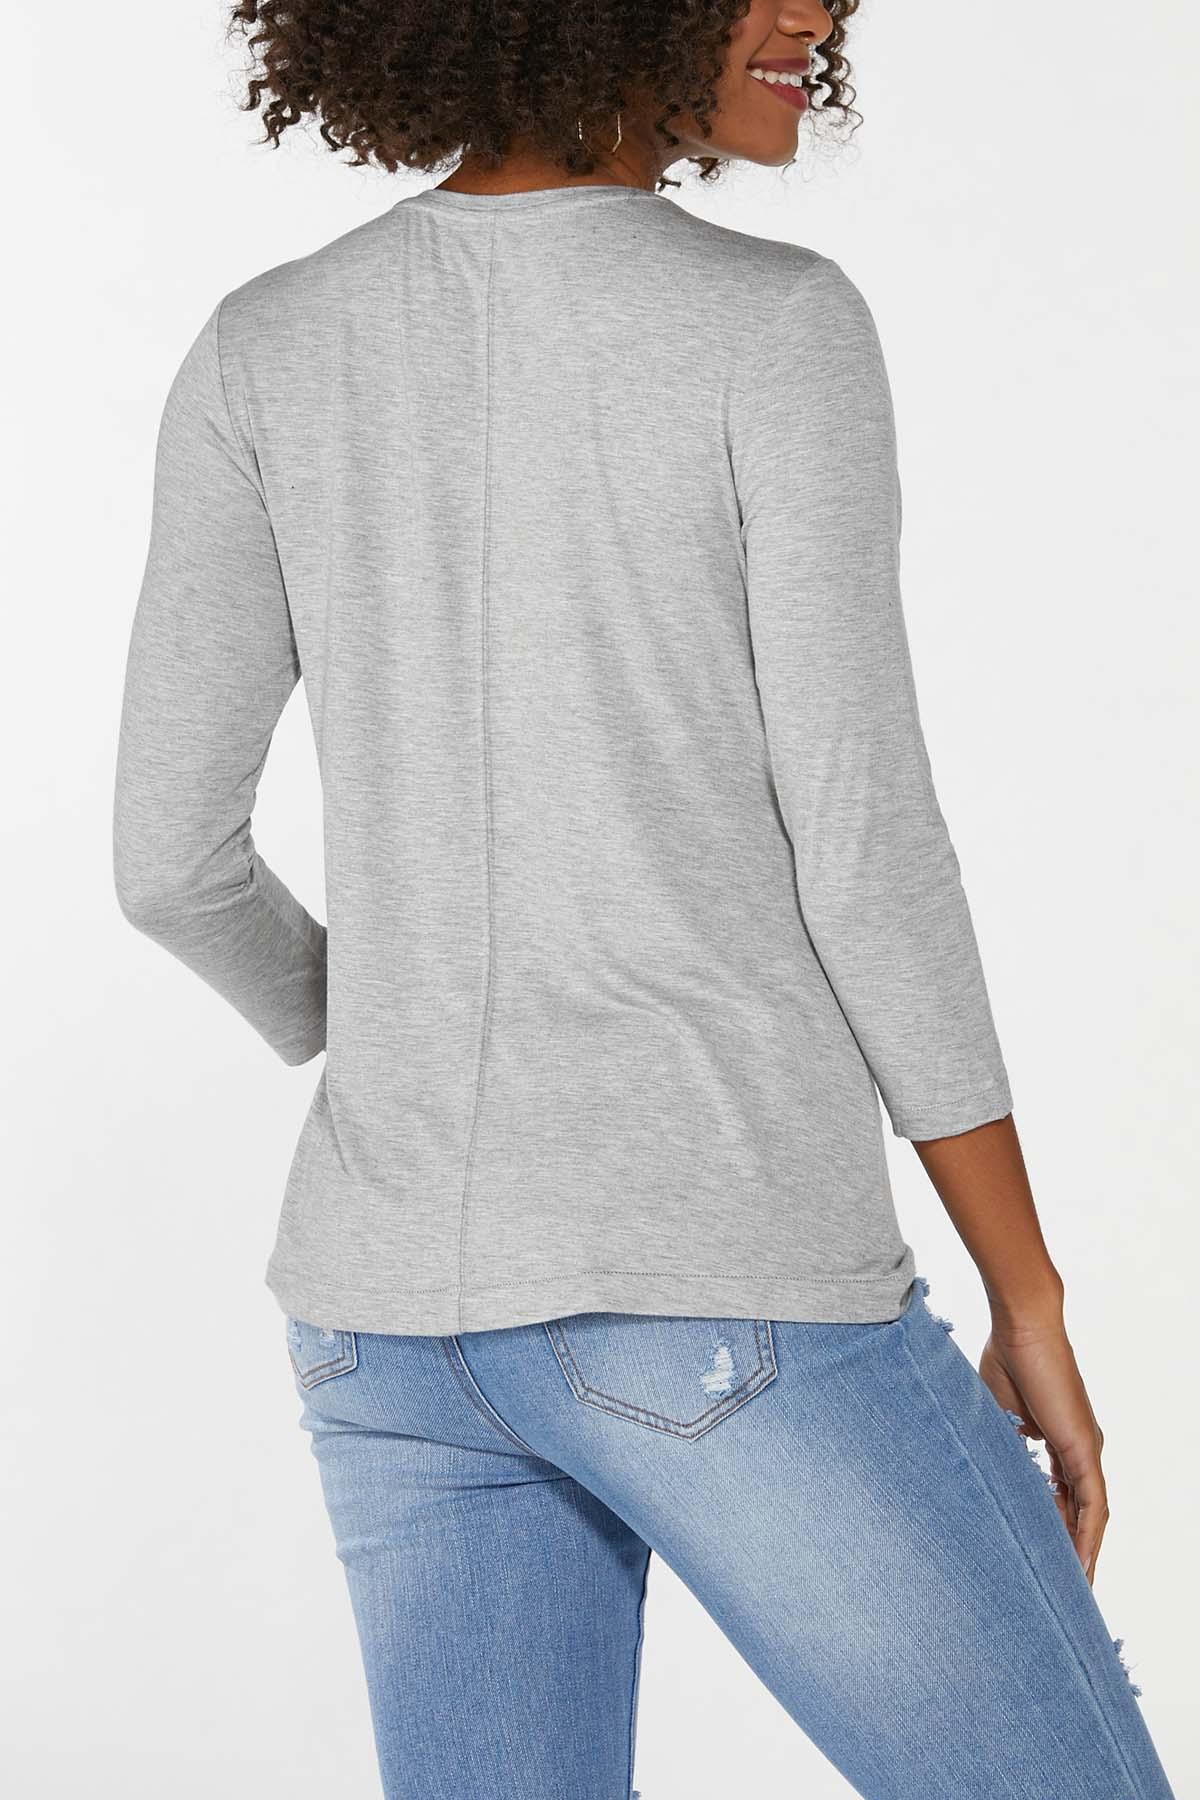 Plus Size Gray Scoop Neck Top (Item #44706357)